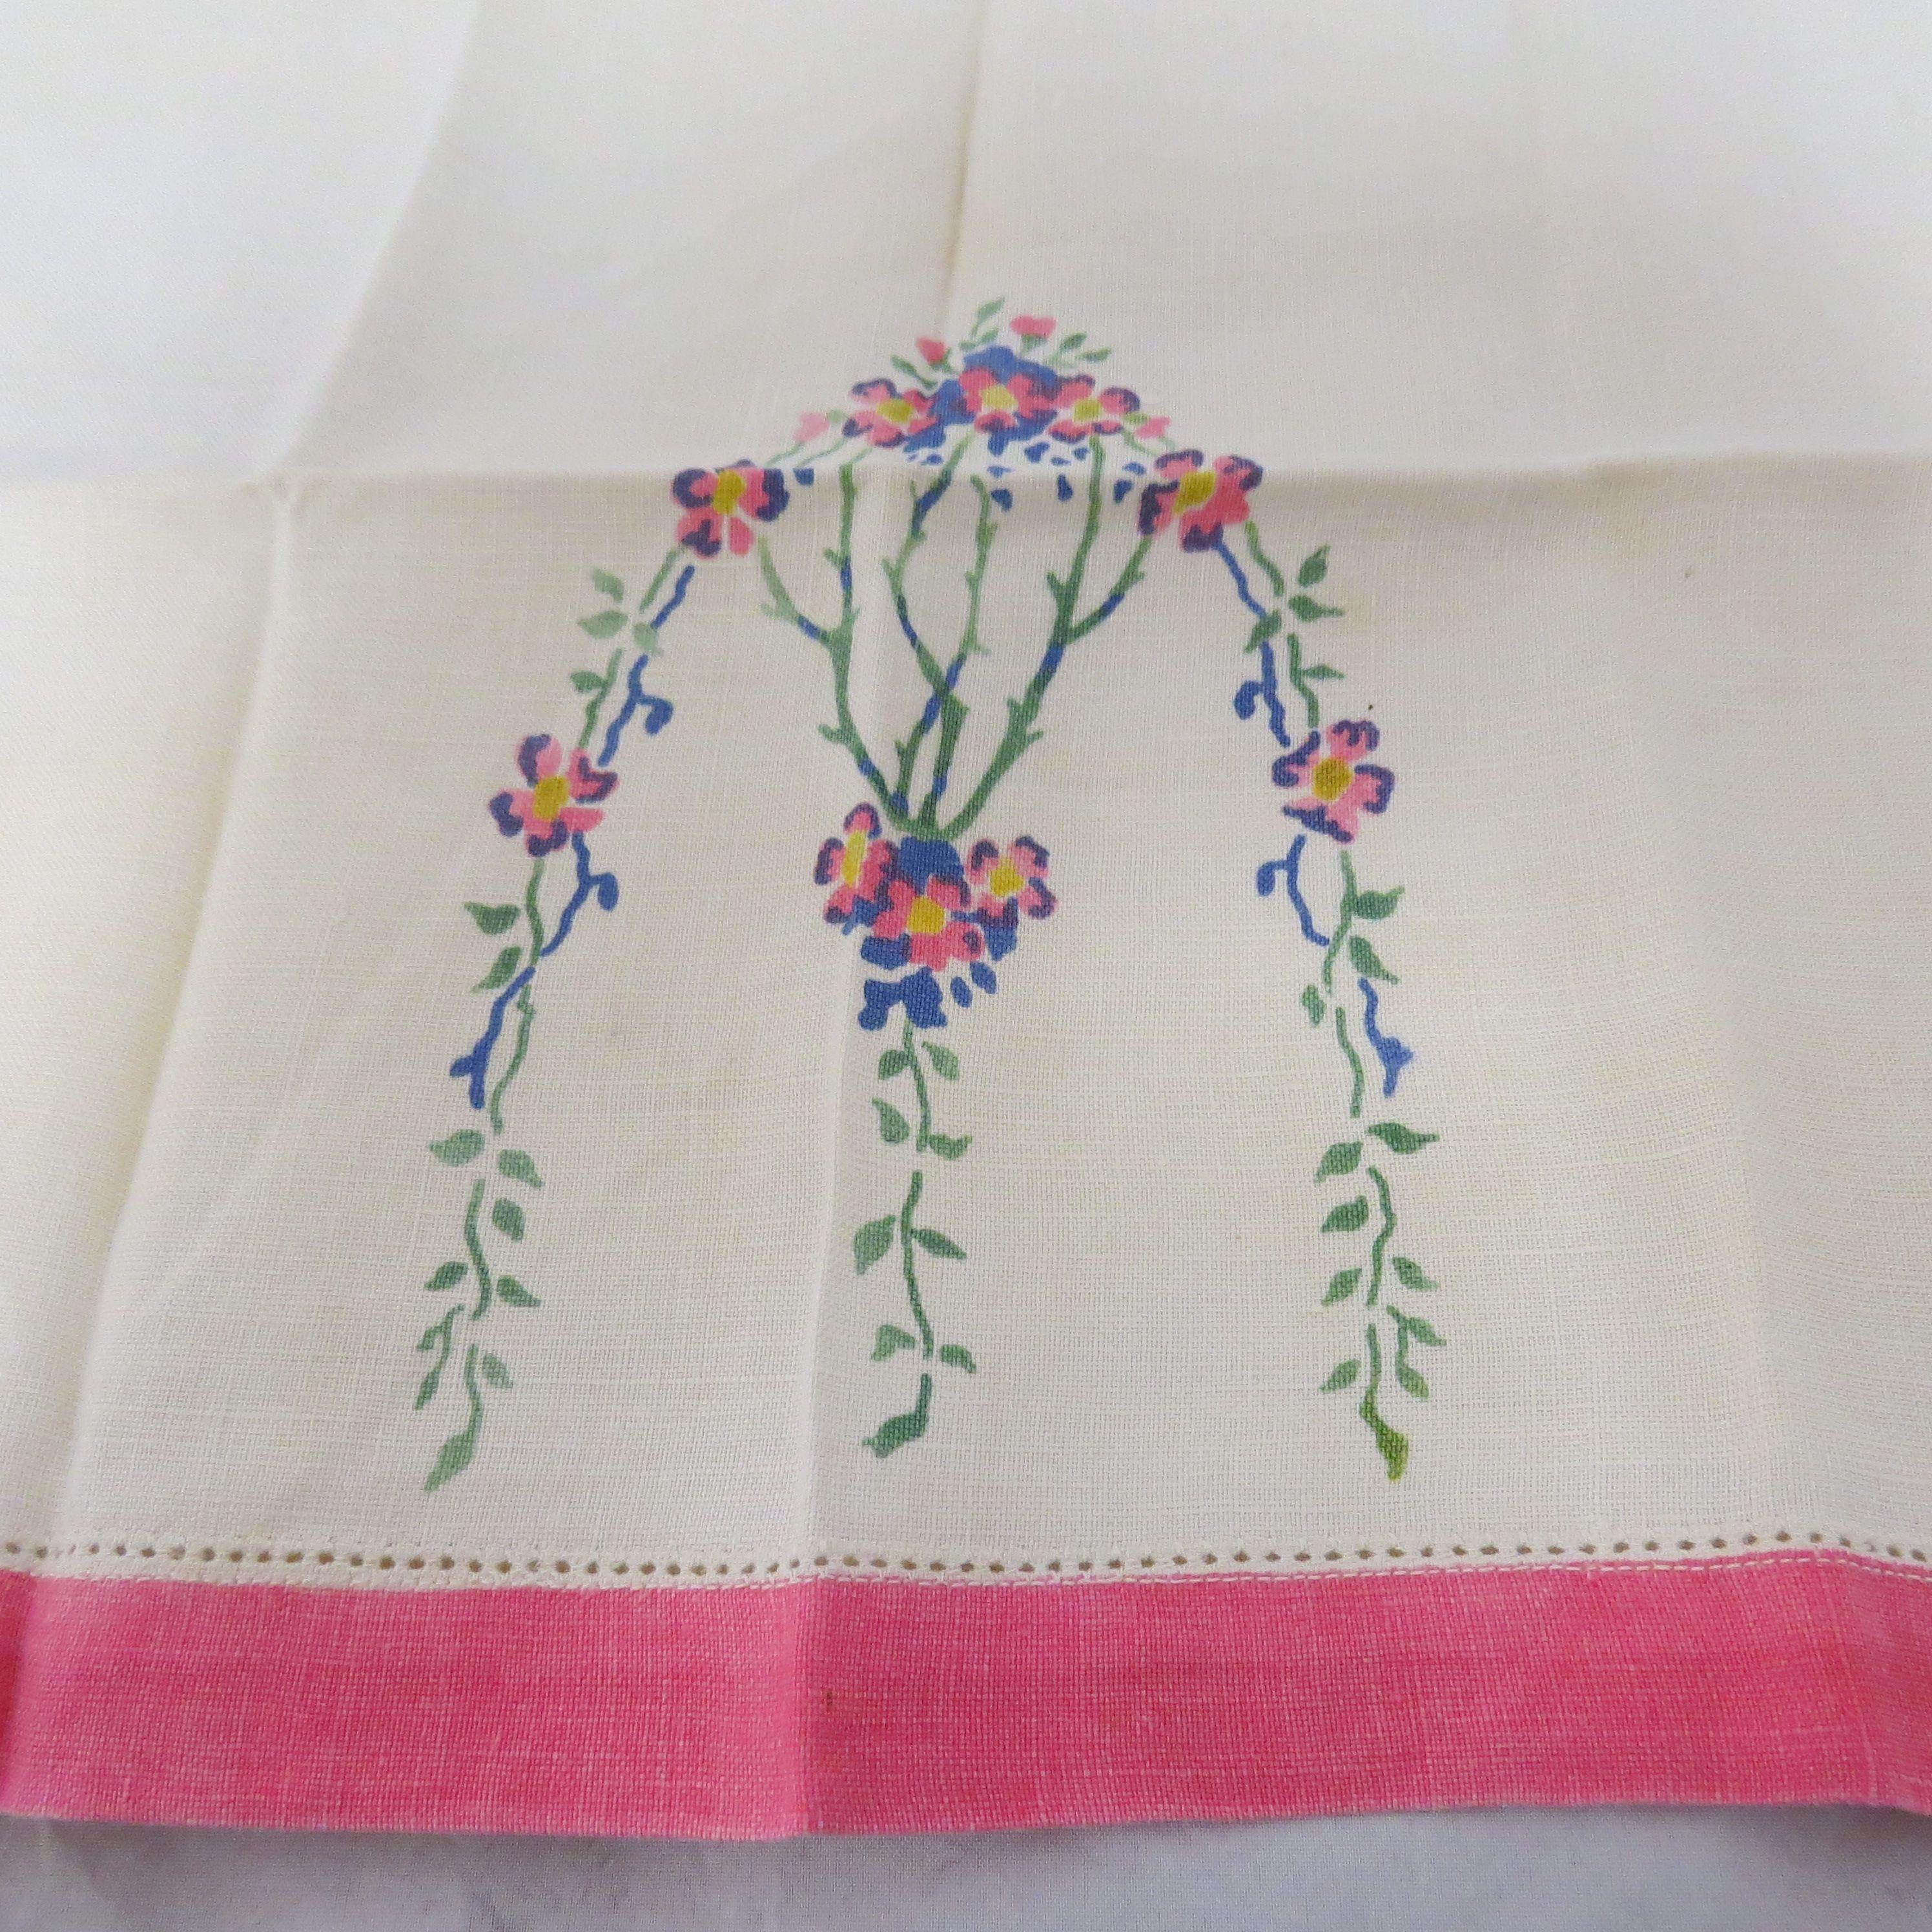 Vintage Stenciled Linen Cup Towel Dish Towel Hand Towel Tea Towel Blue Pink Green Art Nouveau Blue Towels Vintage Linens Hand Towels